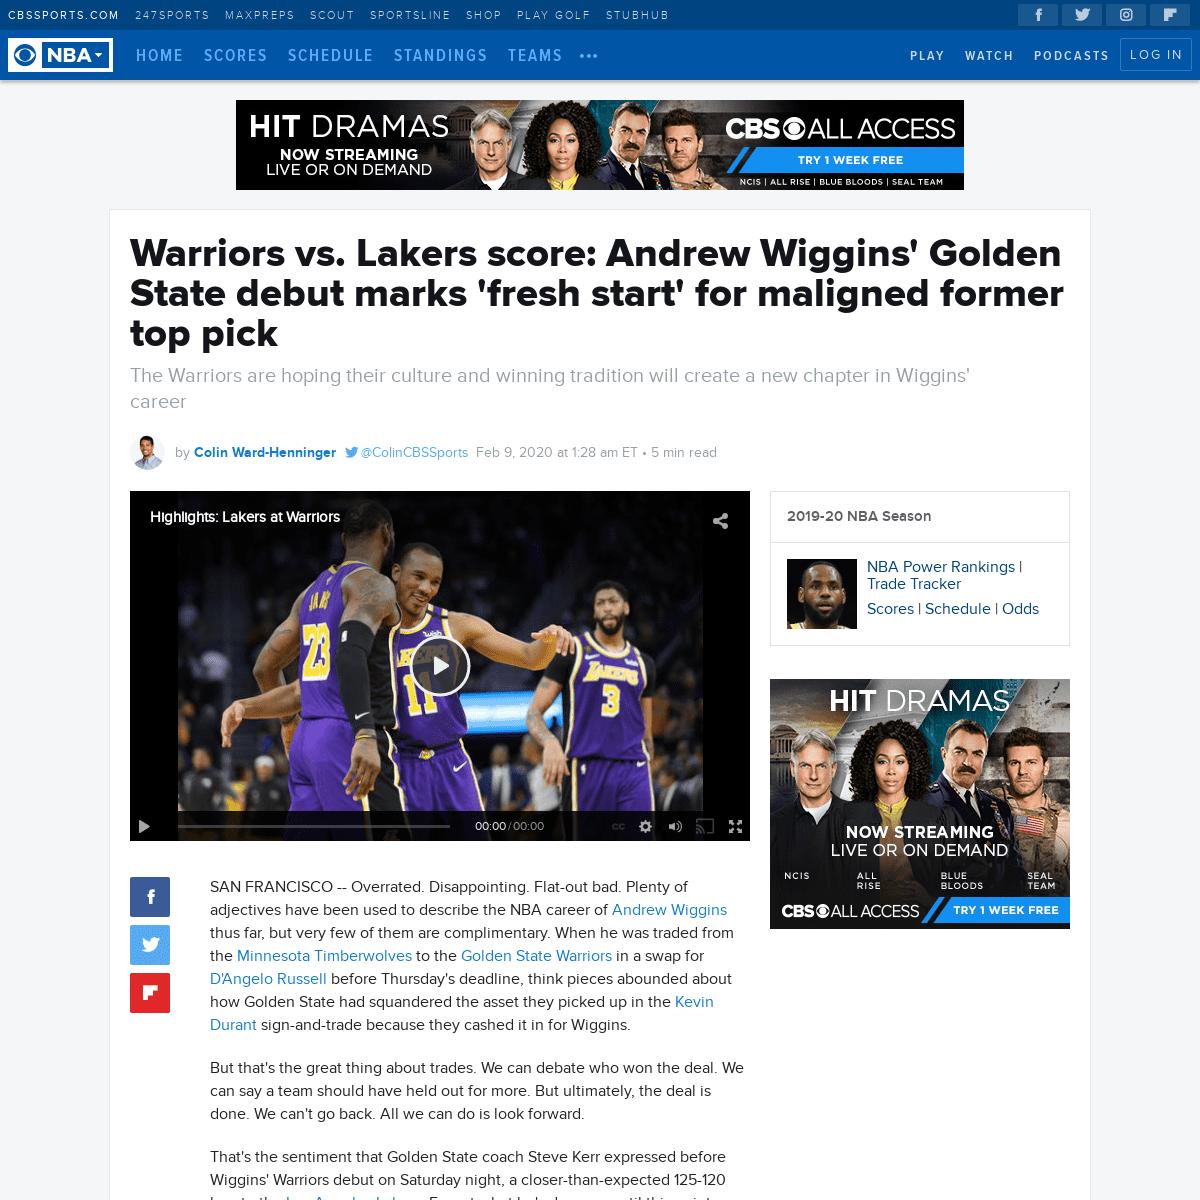 Warriors vs. Lakers score- Andrew Wiggins' Golden State debut marks 'fresh start' for maligned former top pick - CBSSports.com